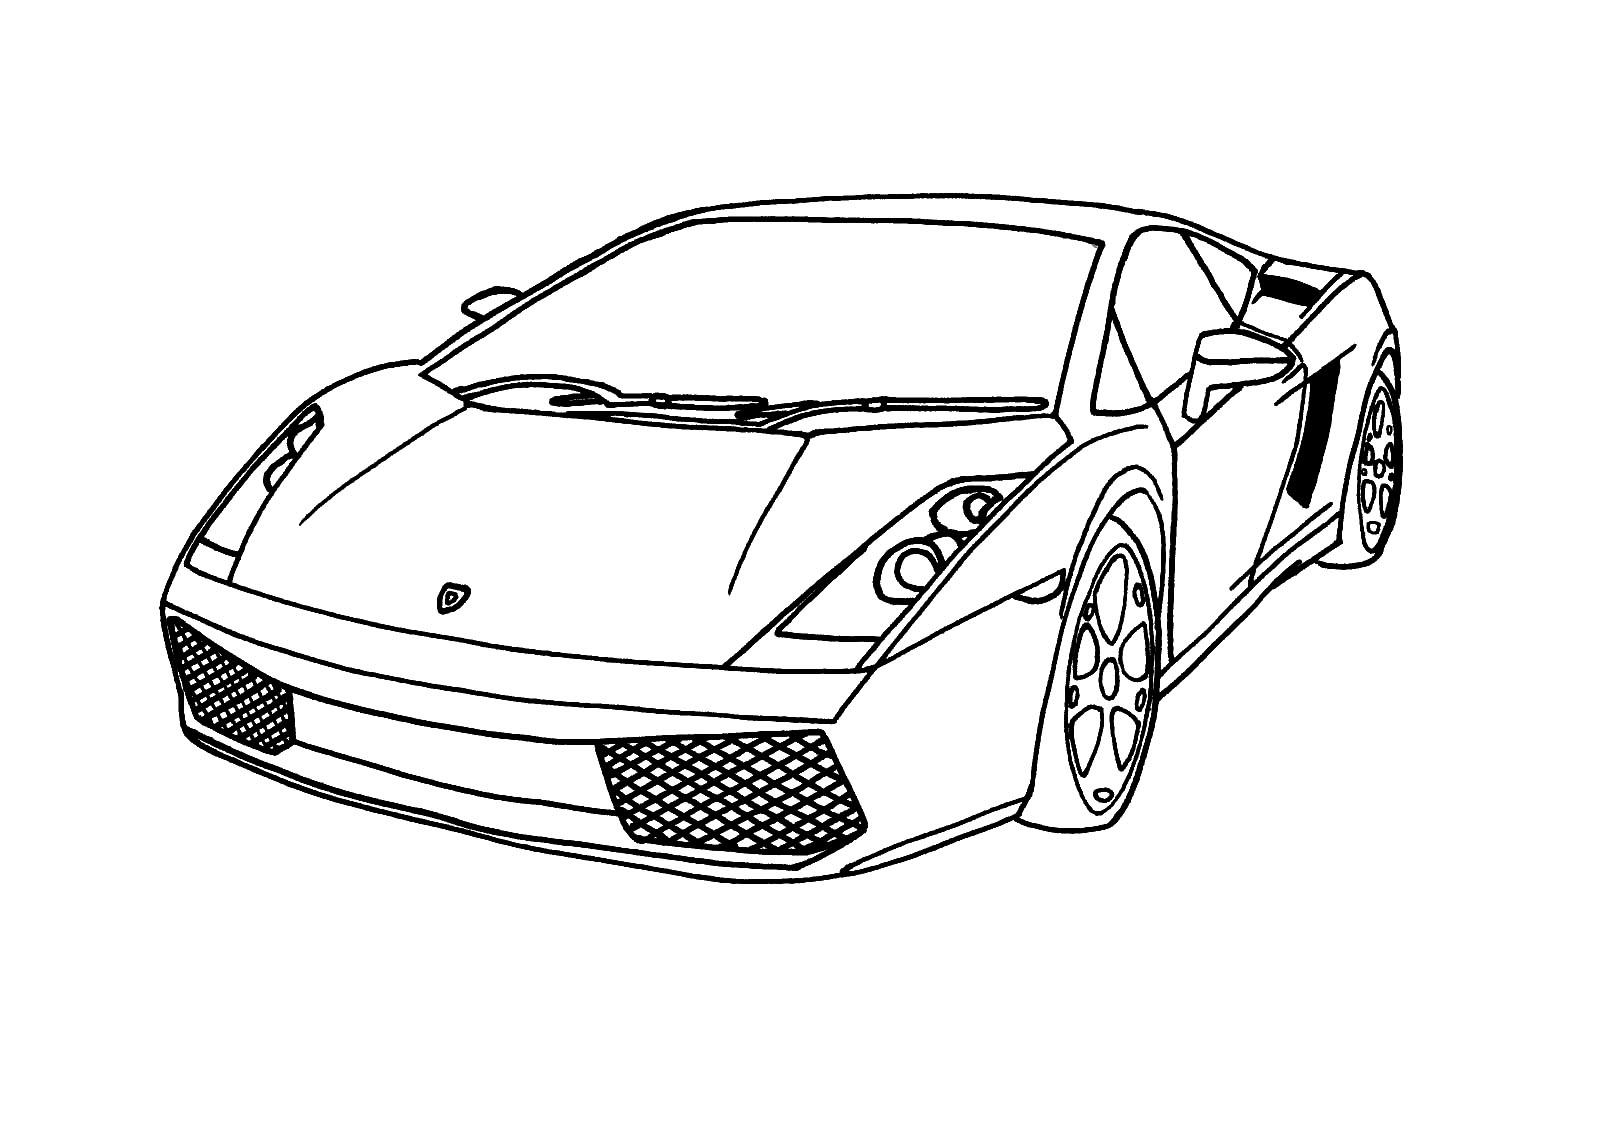 Descargue e imprima gratis dibujos para colorear – automovil